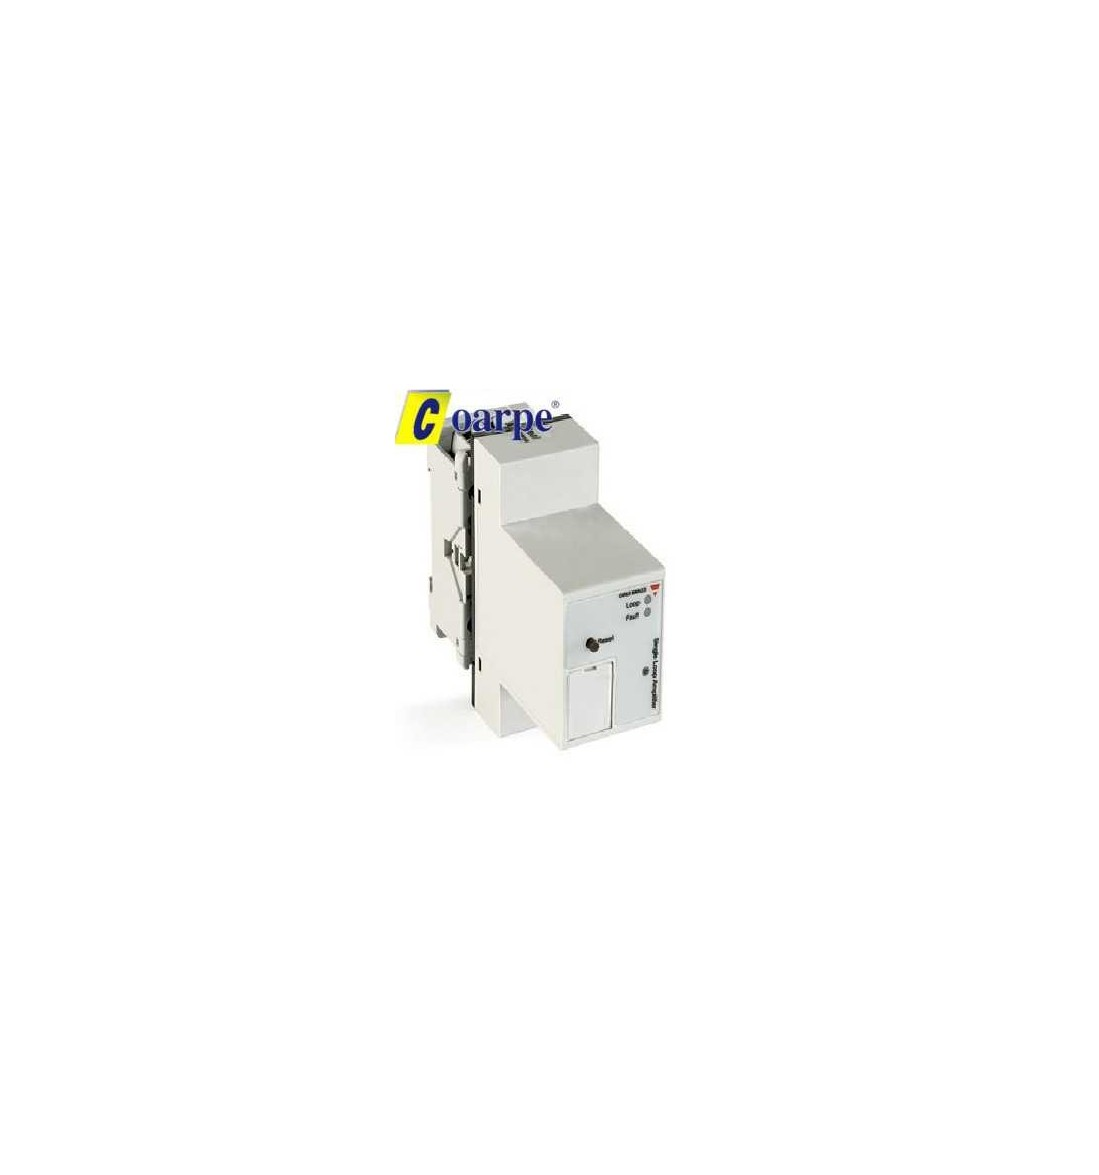 Detector de bucle magnético LBUC2